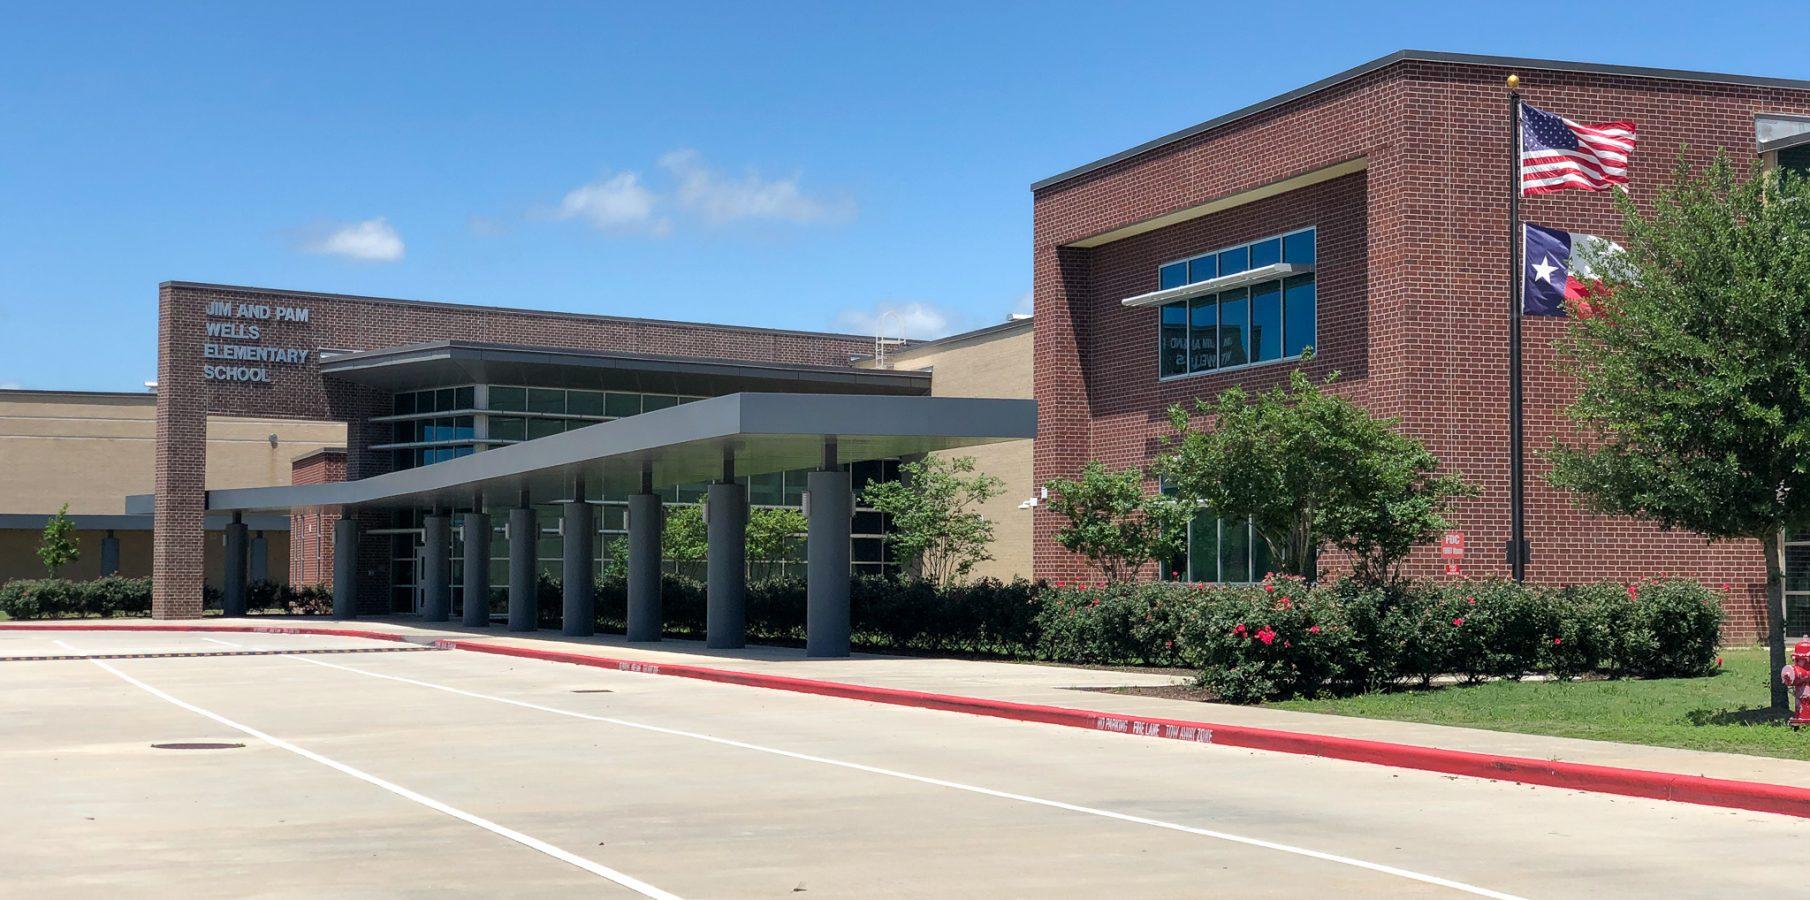 Wells Elementary School